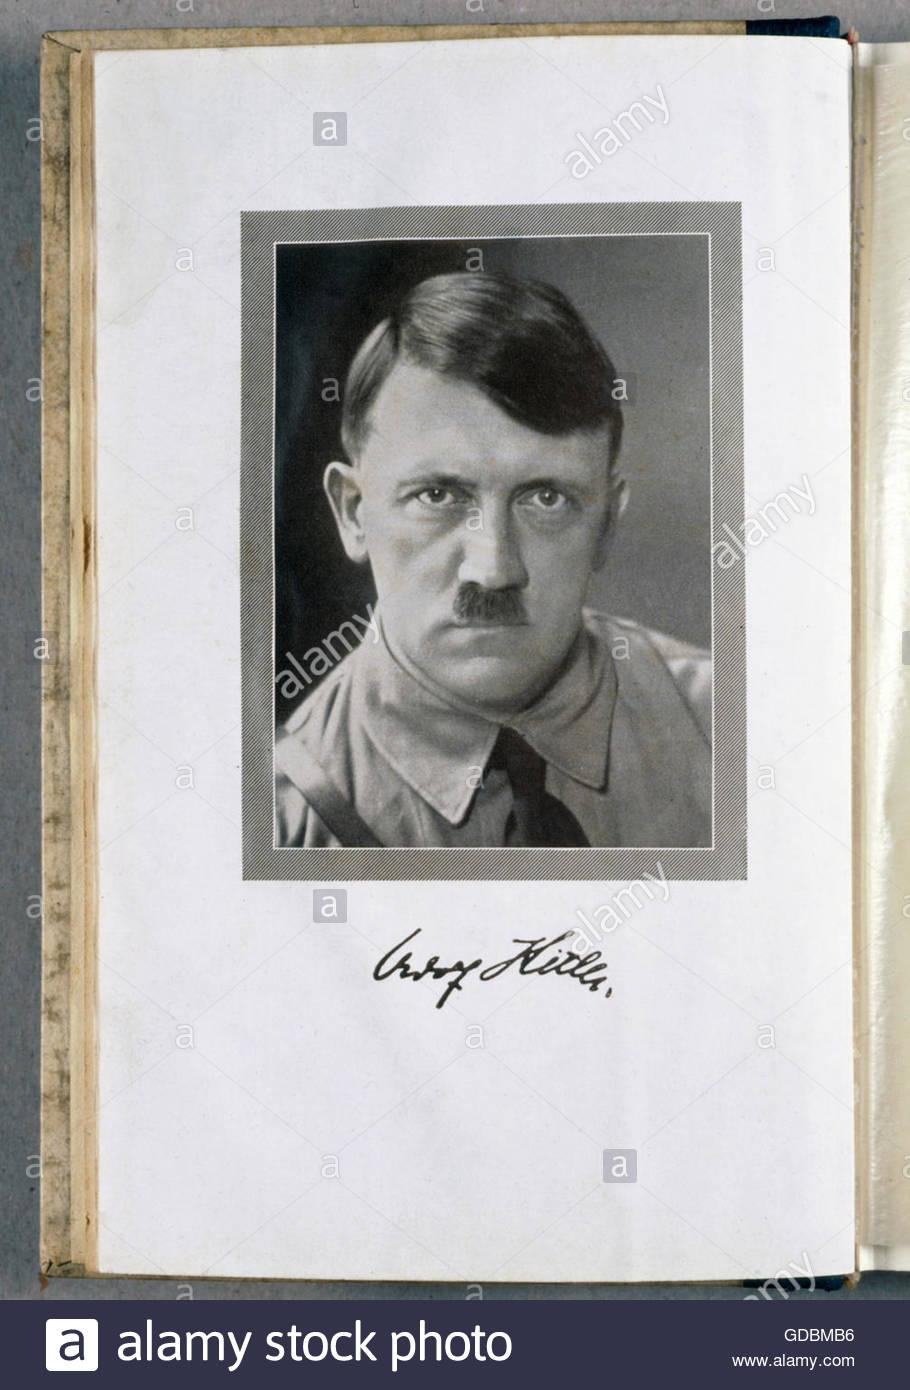 Hitler, Adolf, 20.4.1889 - 30.4.1945, German politician (NSDAP), portrait, frontispiece of his book 'Mein Kampf', - Stock Image